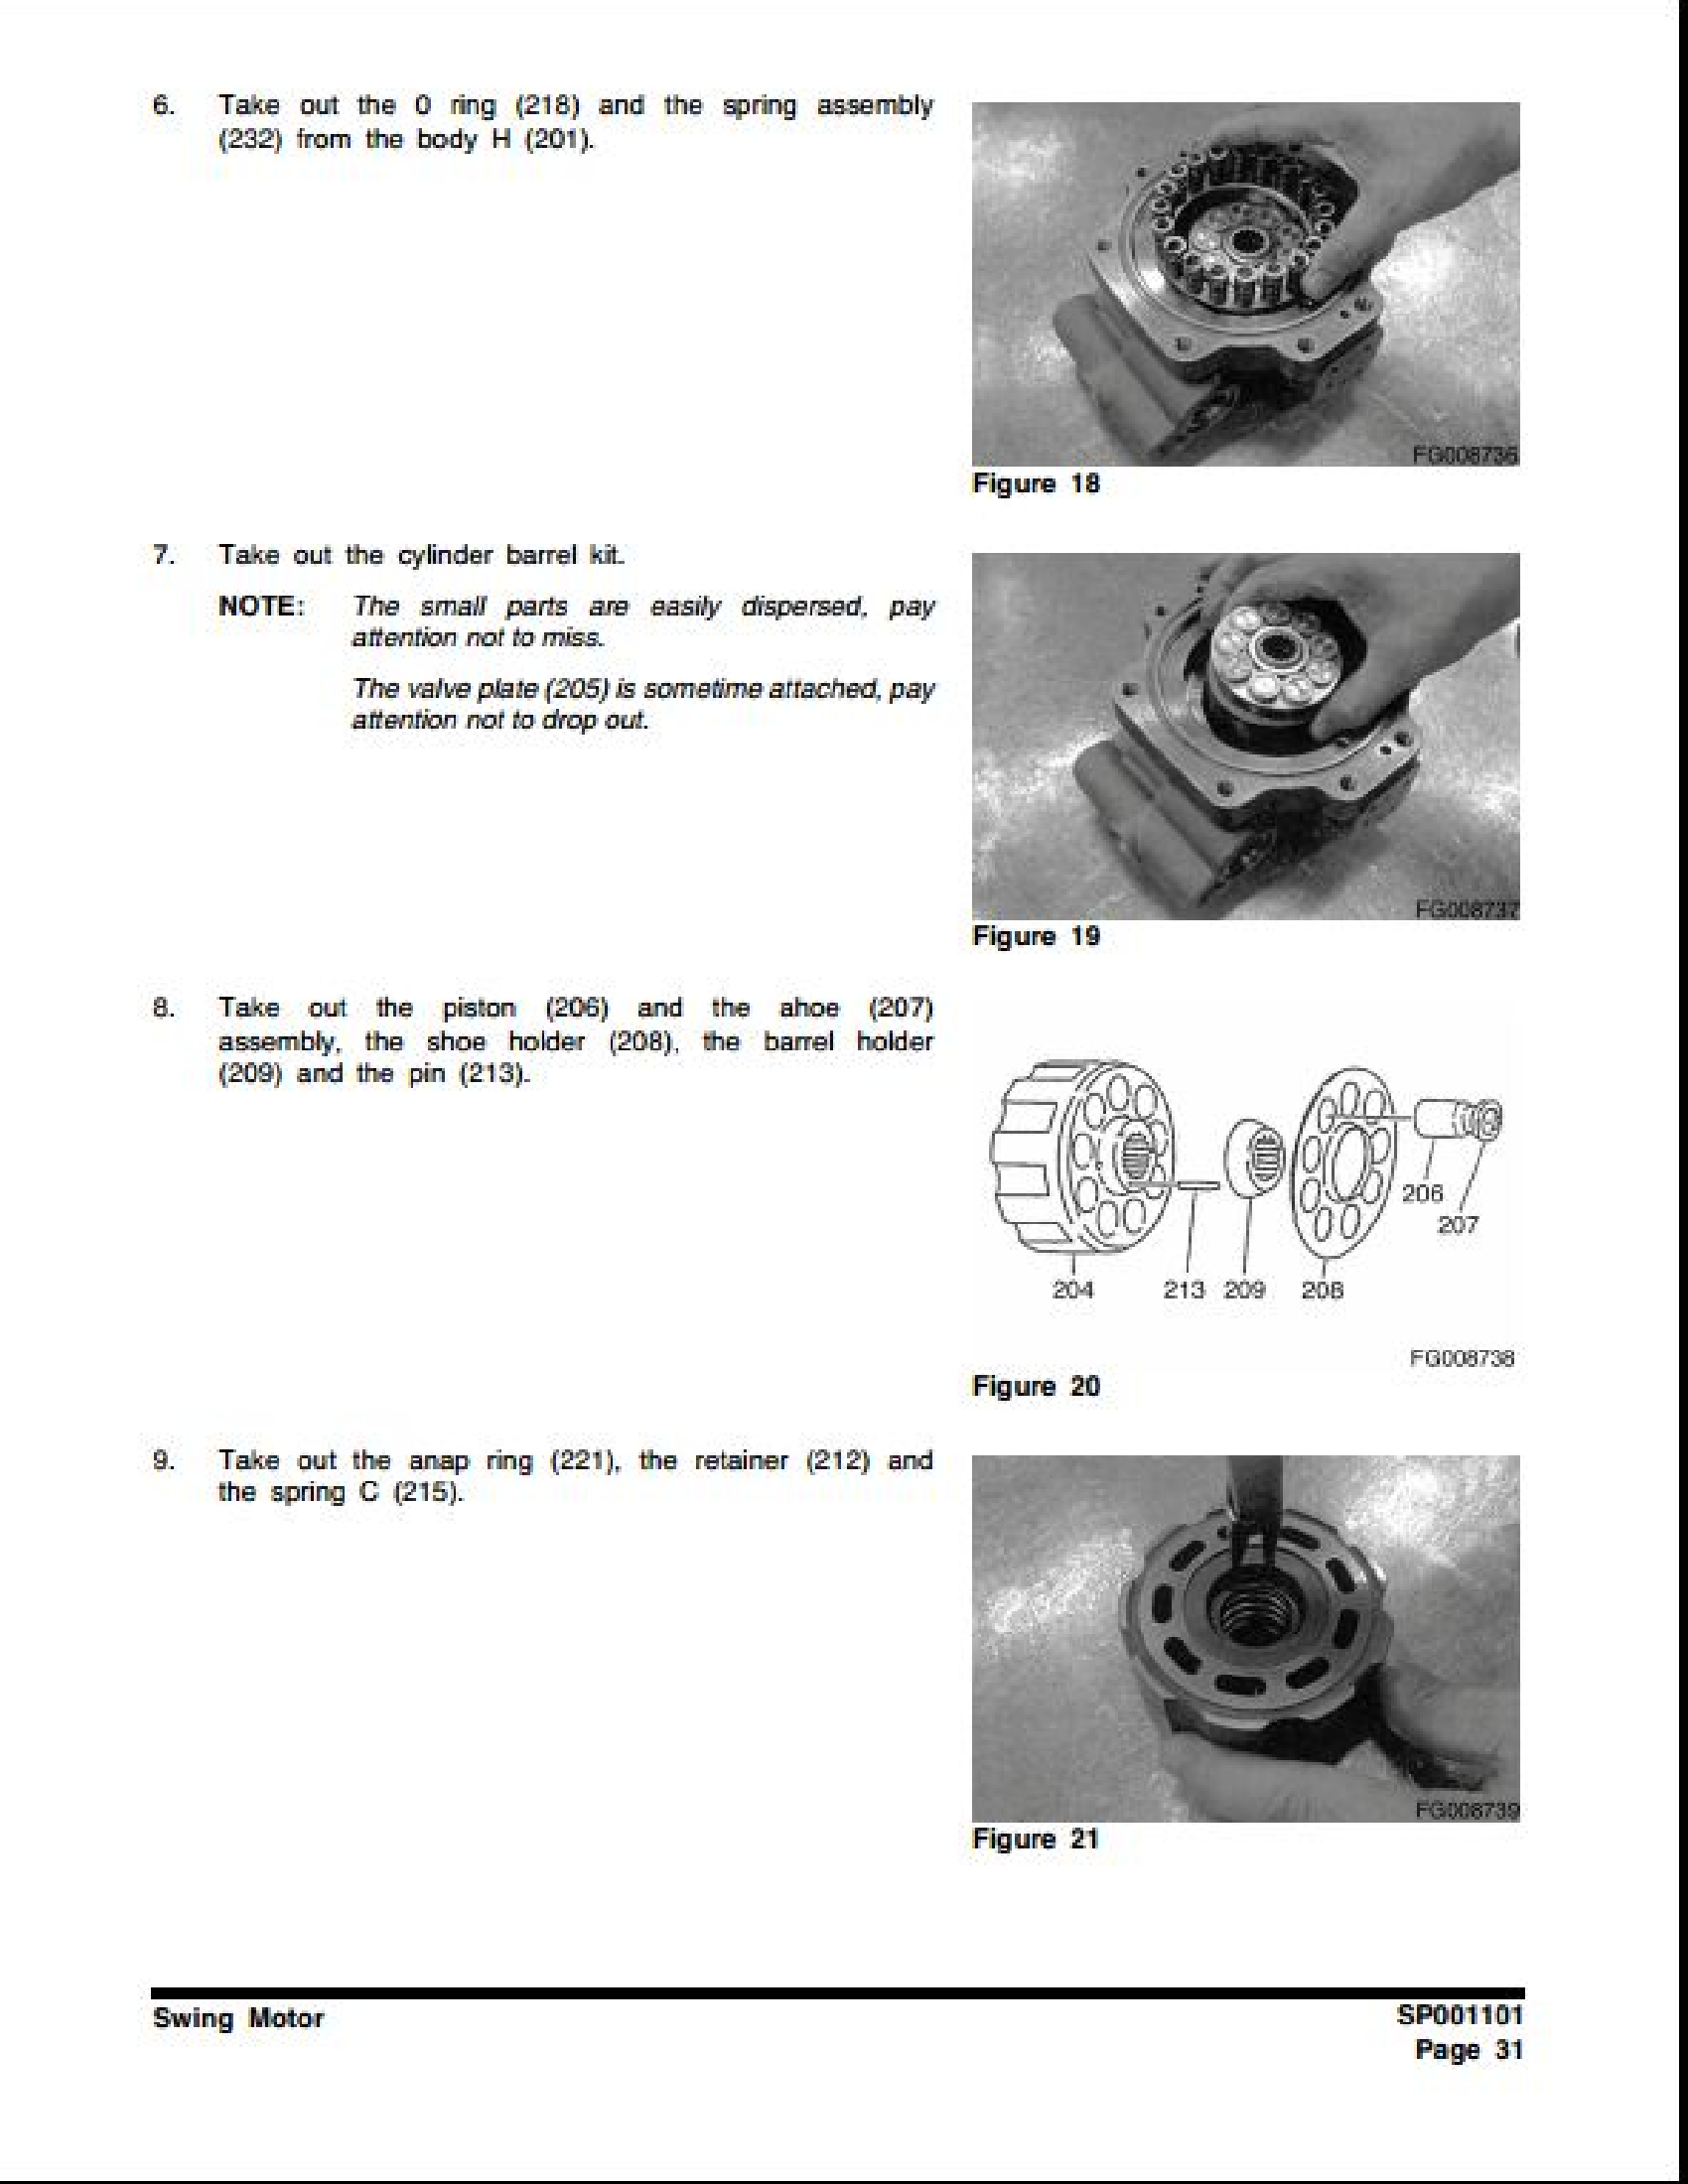 Doosan DX420LC-5 Crawled Excavator manual